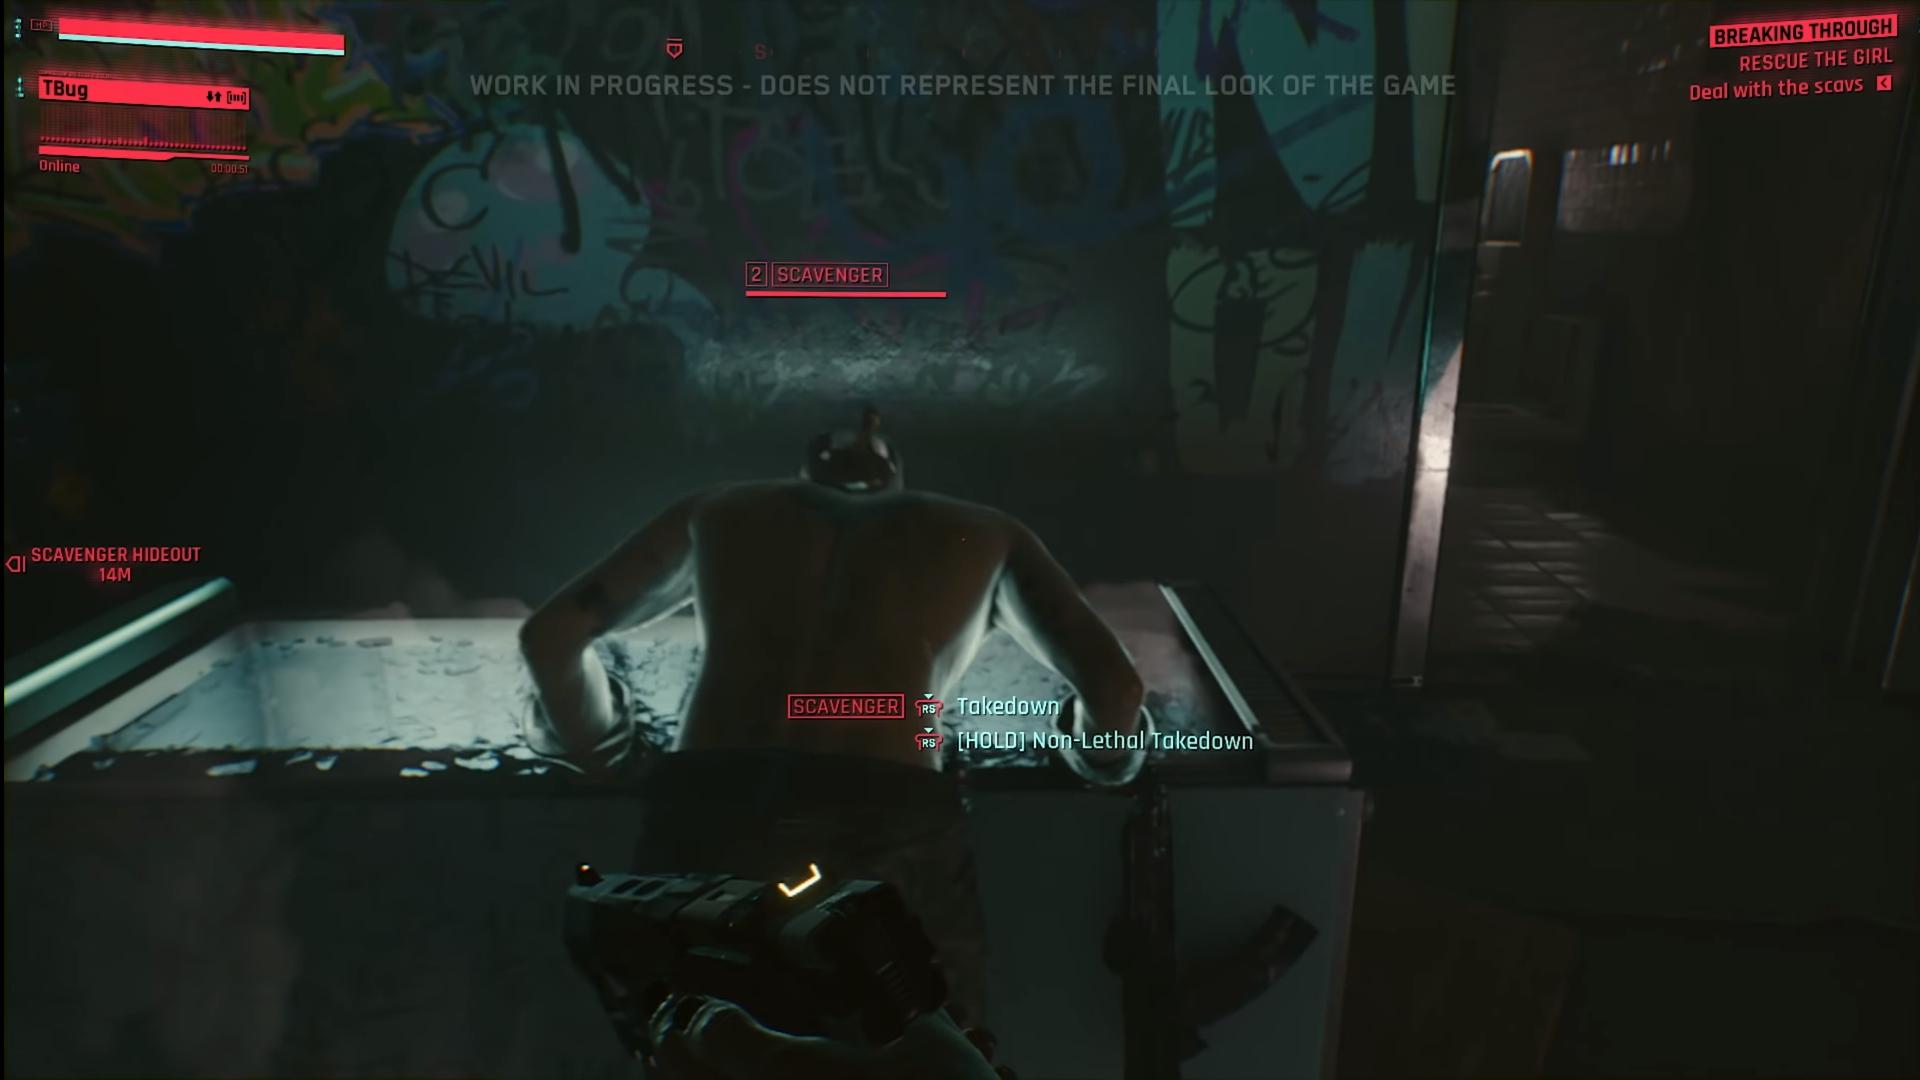 Destrinchamos: confira cada detalhe dos 50 minutos de Cyberpunk 2077